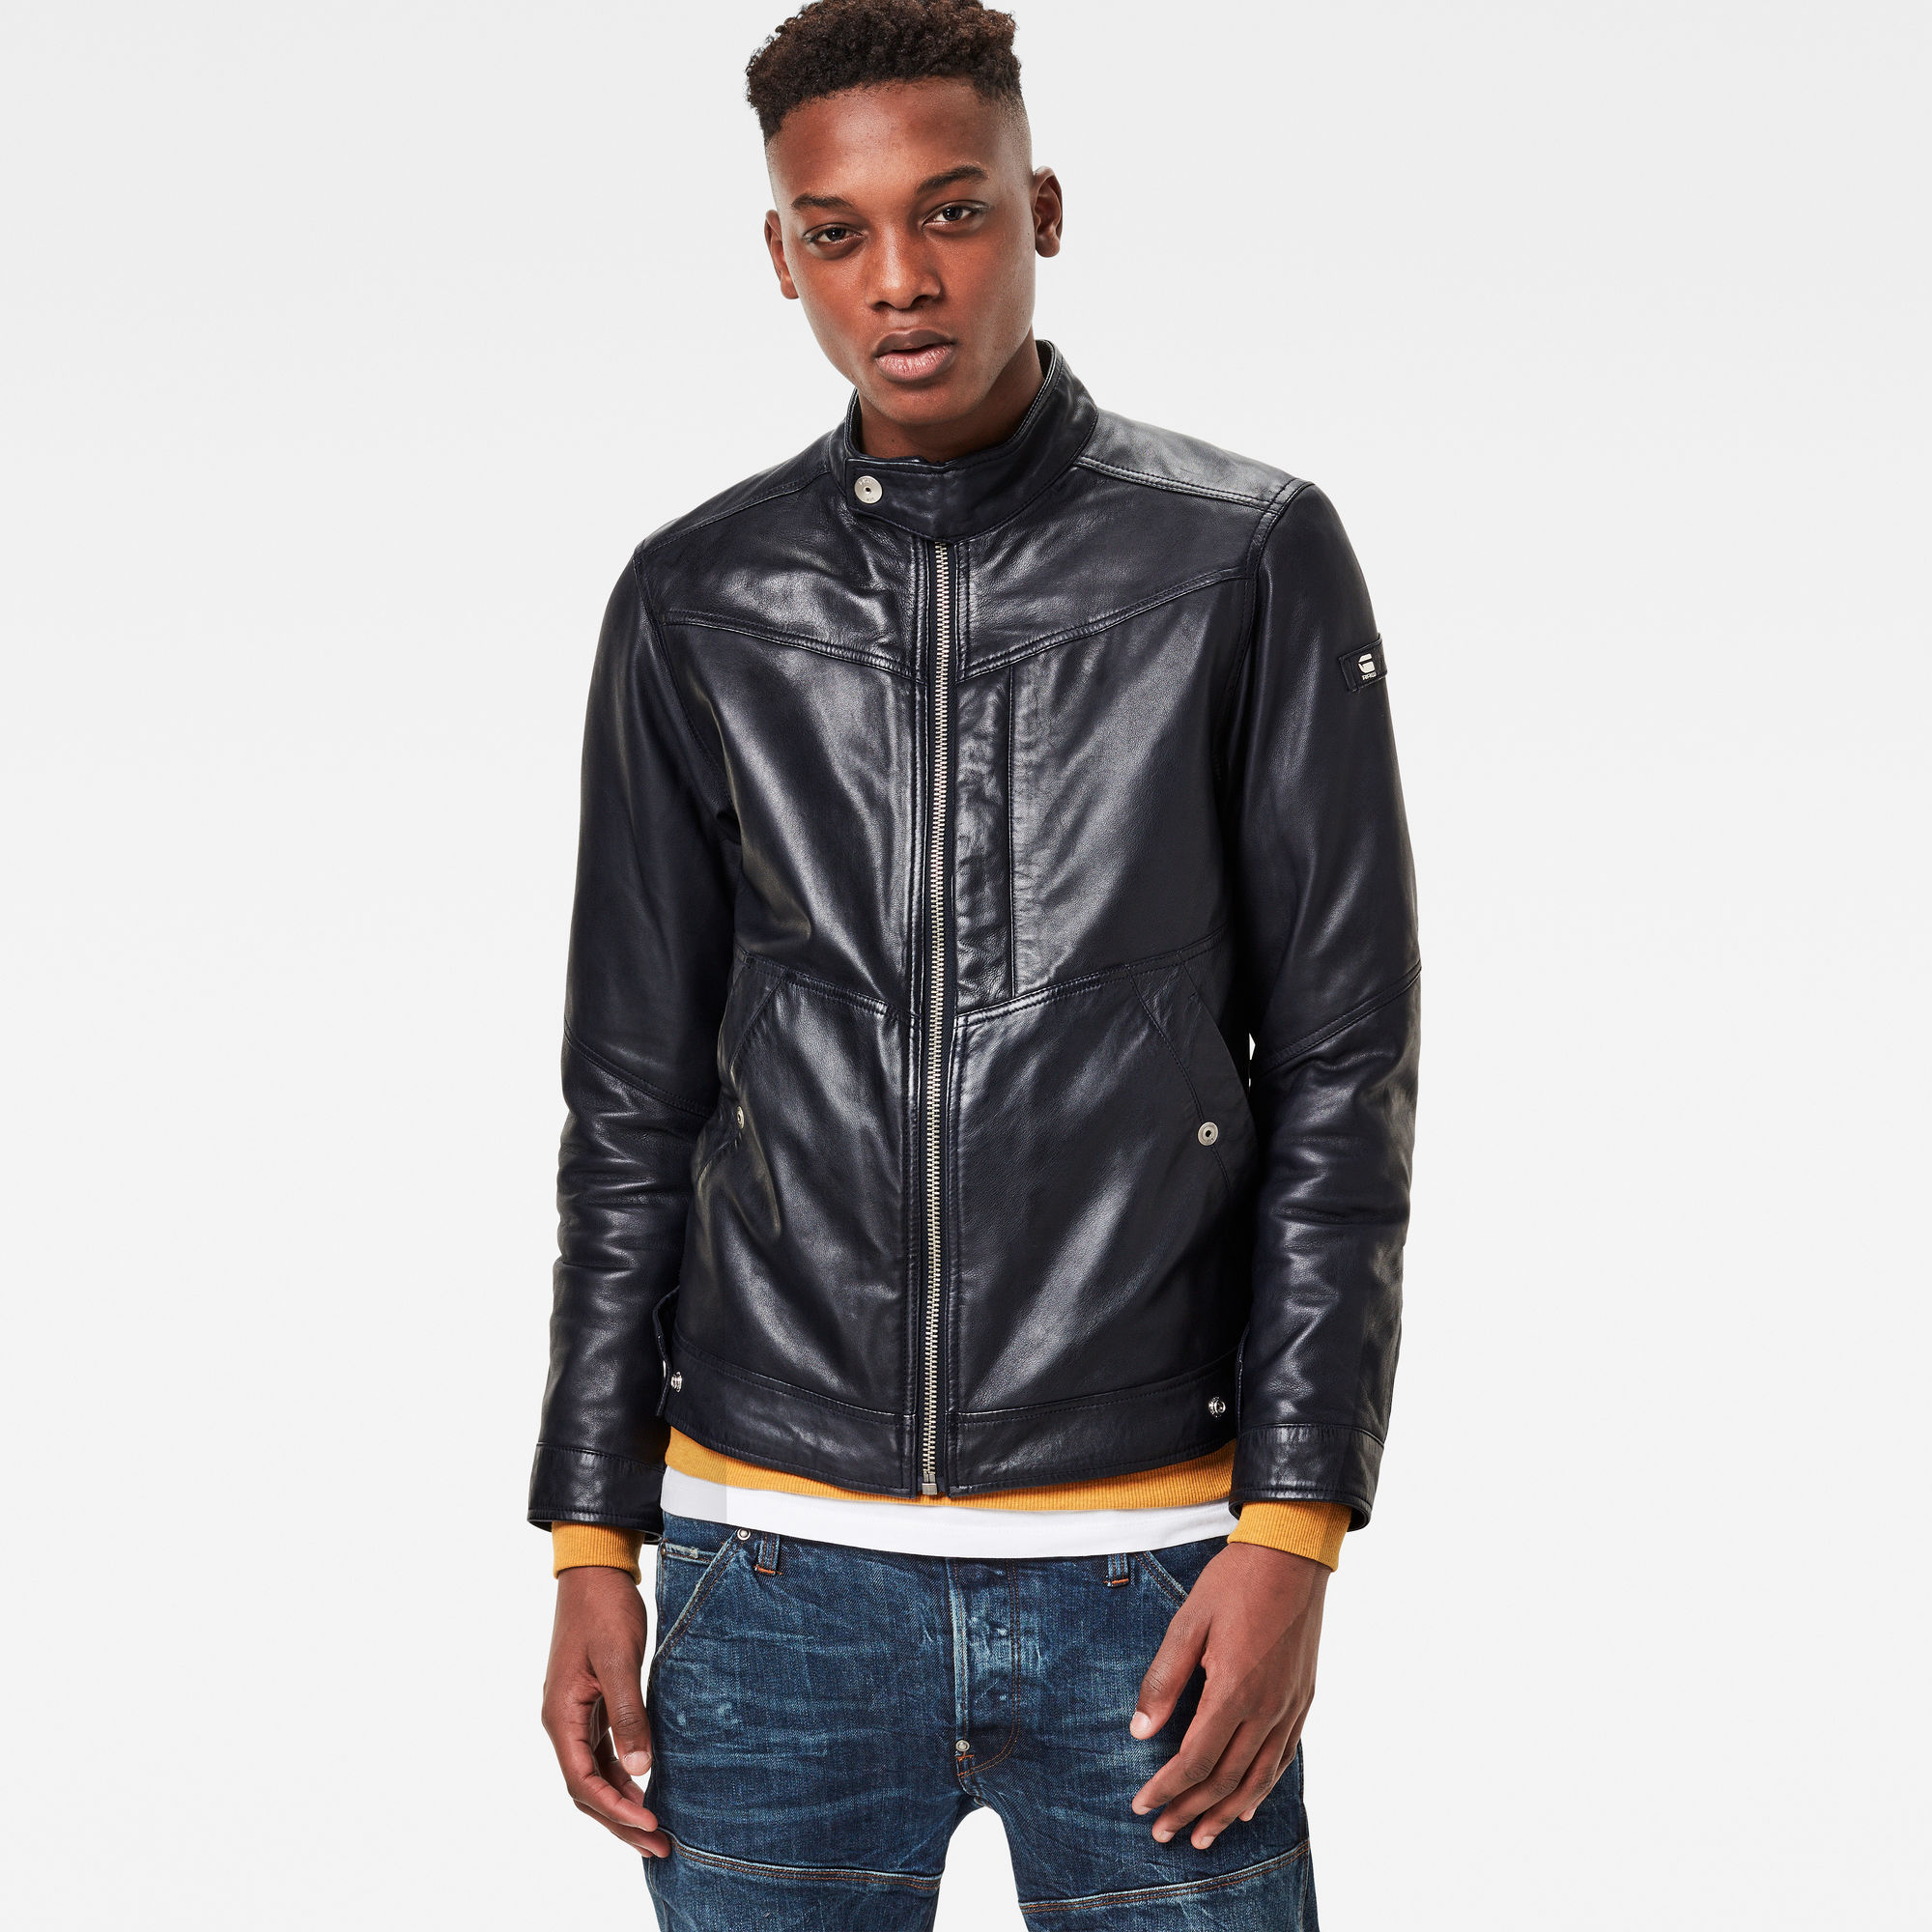 Deline Leather Jacket